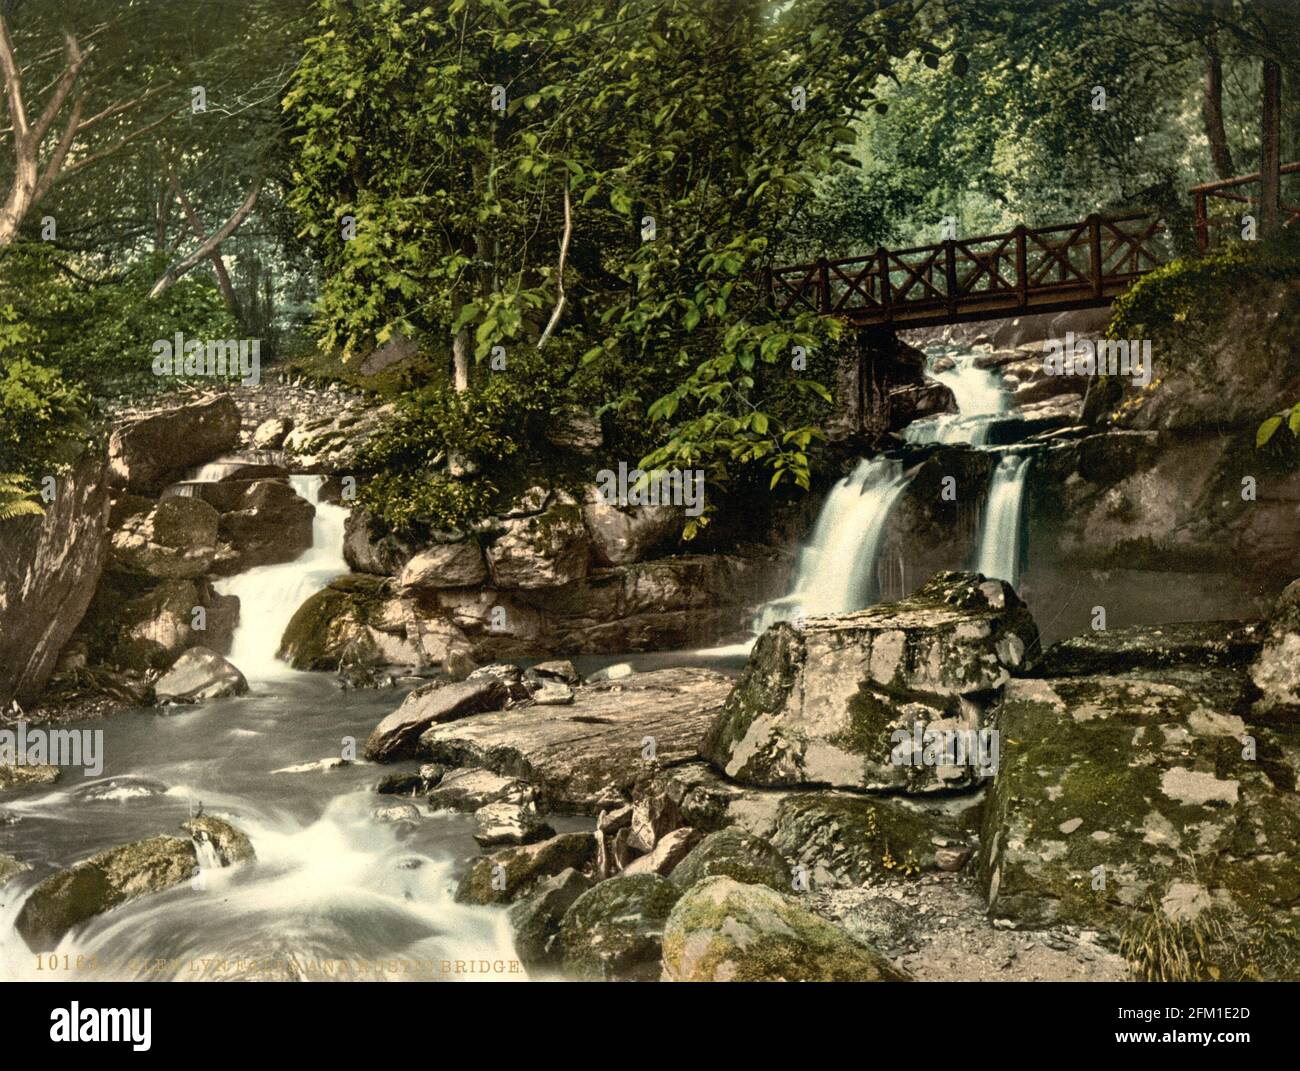 Glen Lyn Gorge bei Lynmouth in Devin um 1890-1900 Stockfoto